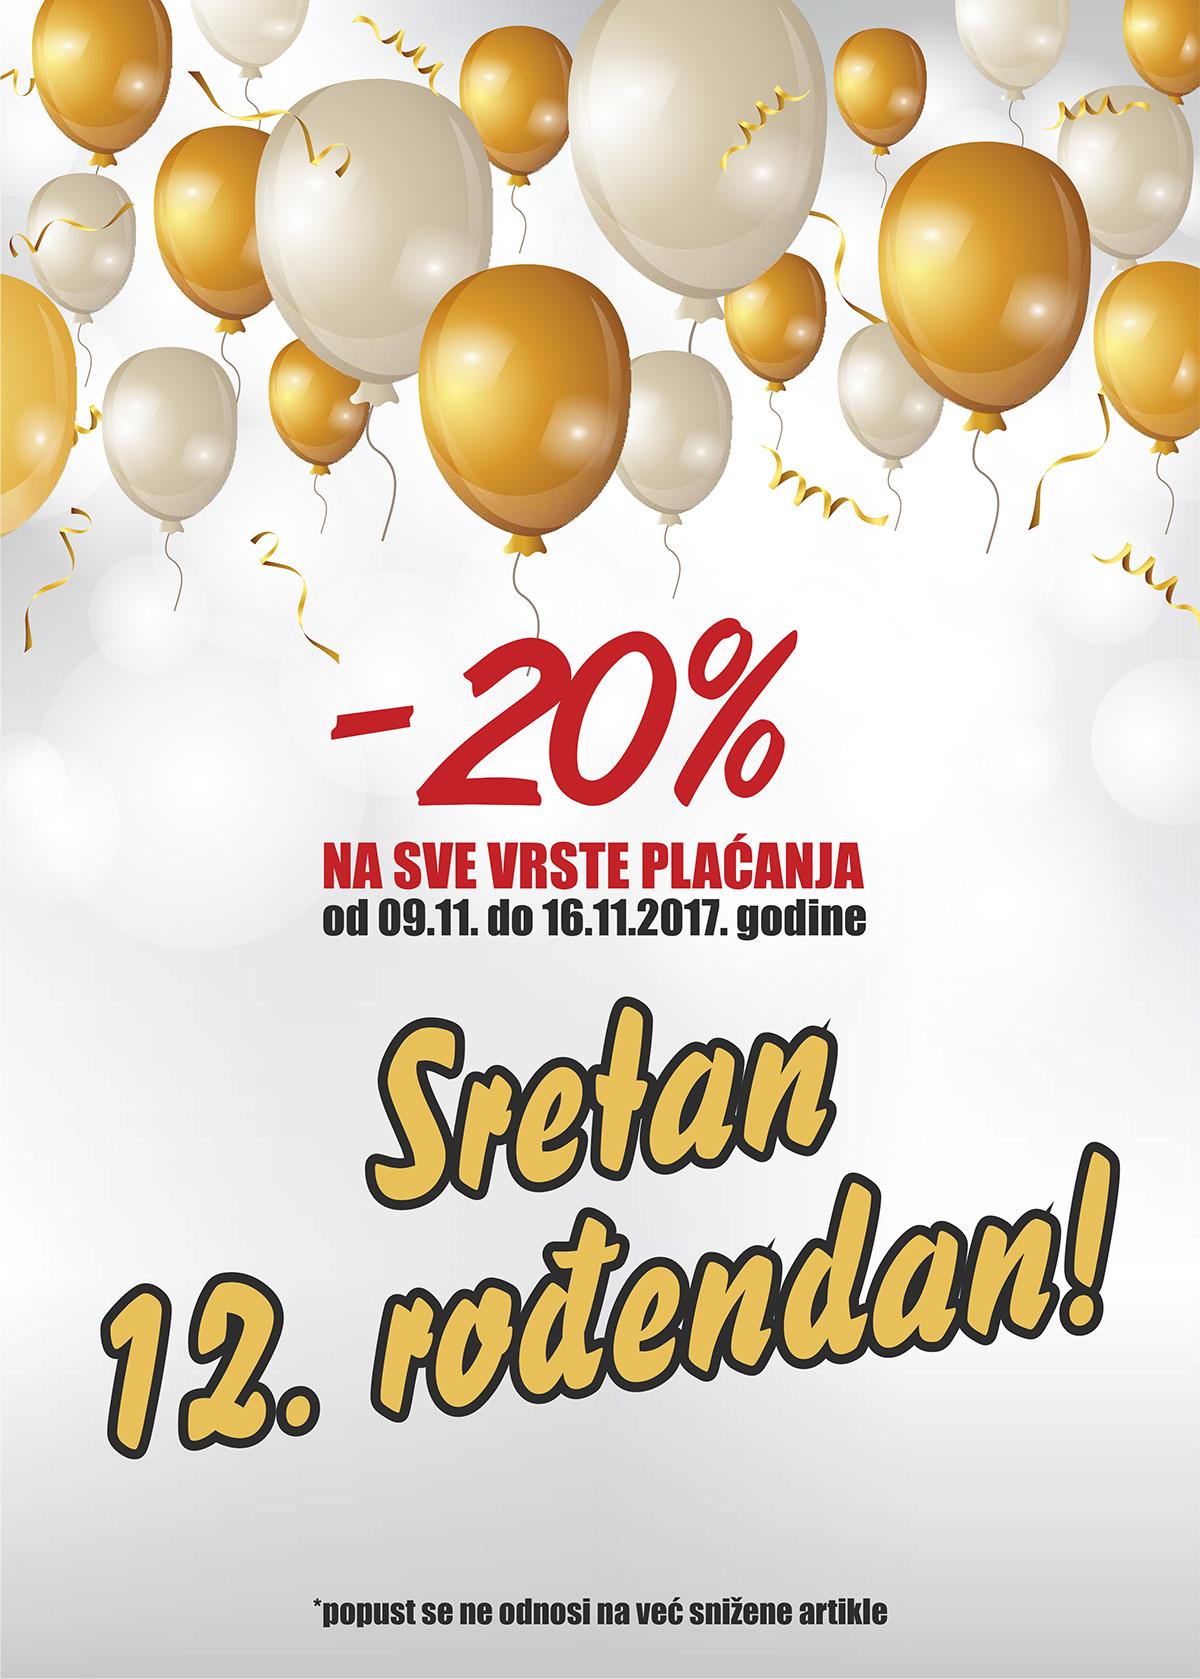 Kare poster.cdr